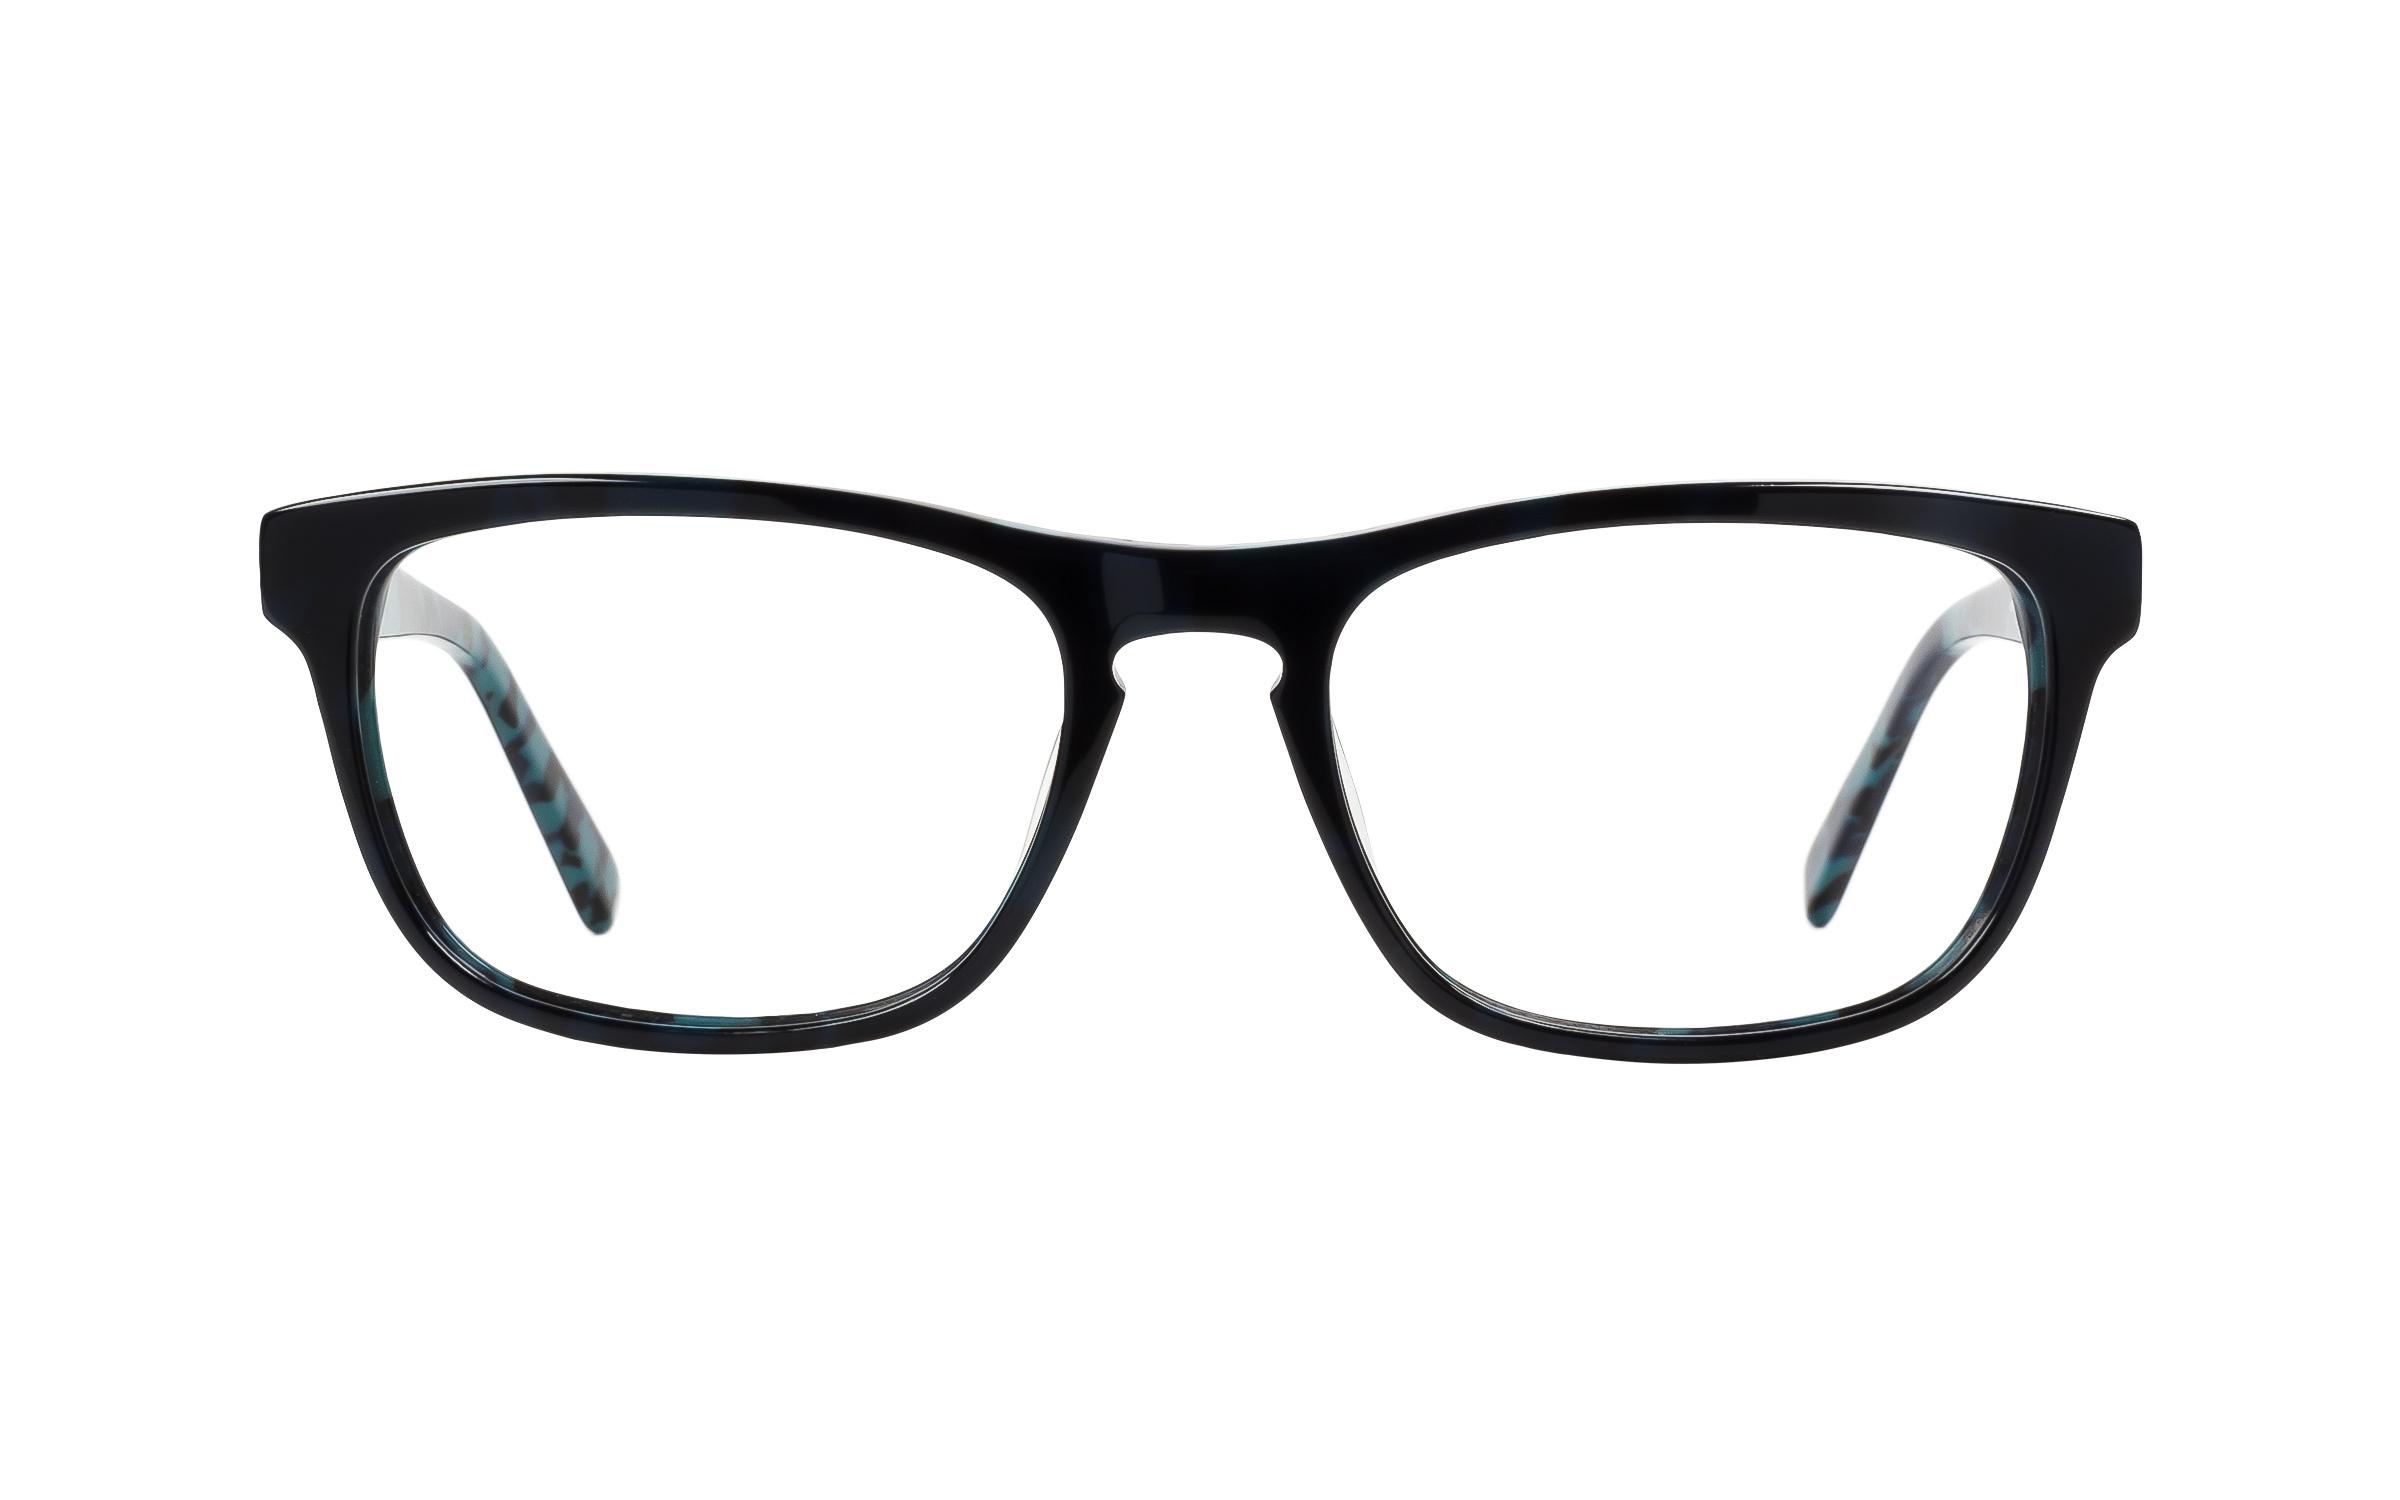 JK London Boston Manor P02 Blue Camo Glasses, Eyeglasses ...